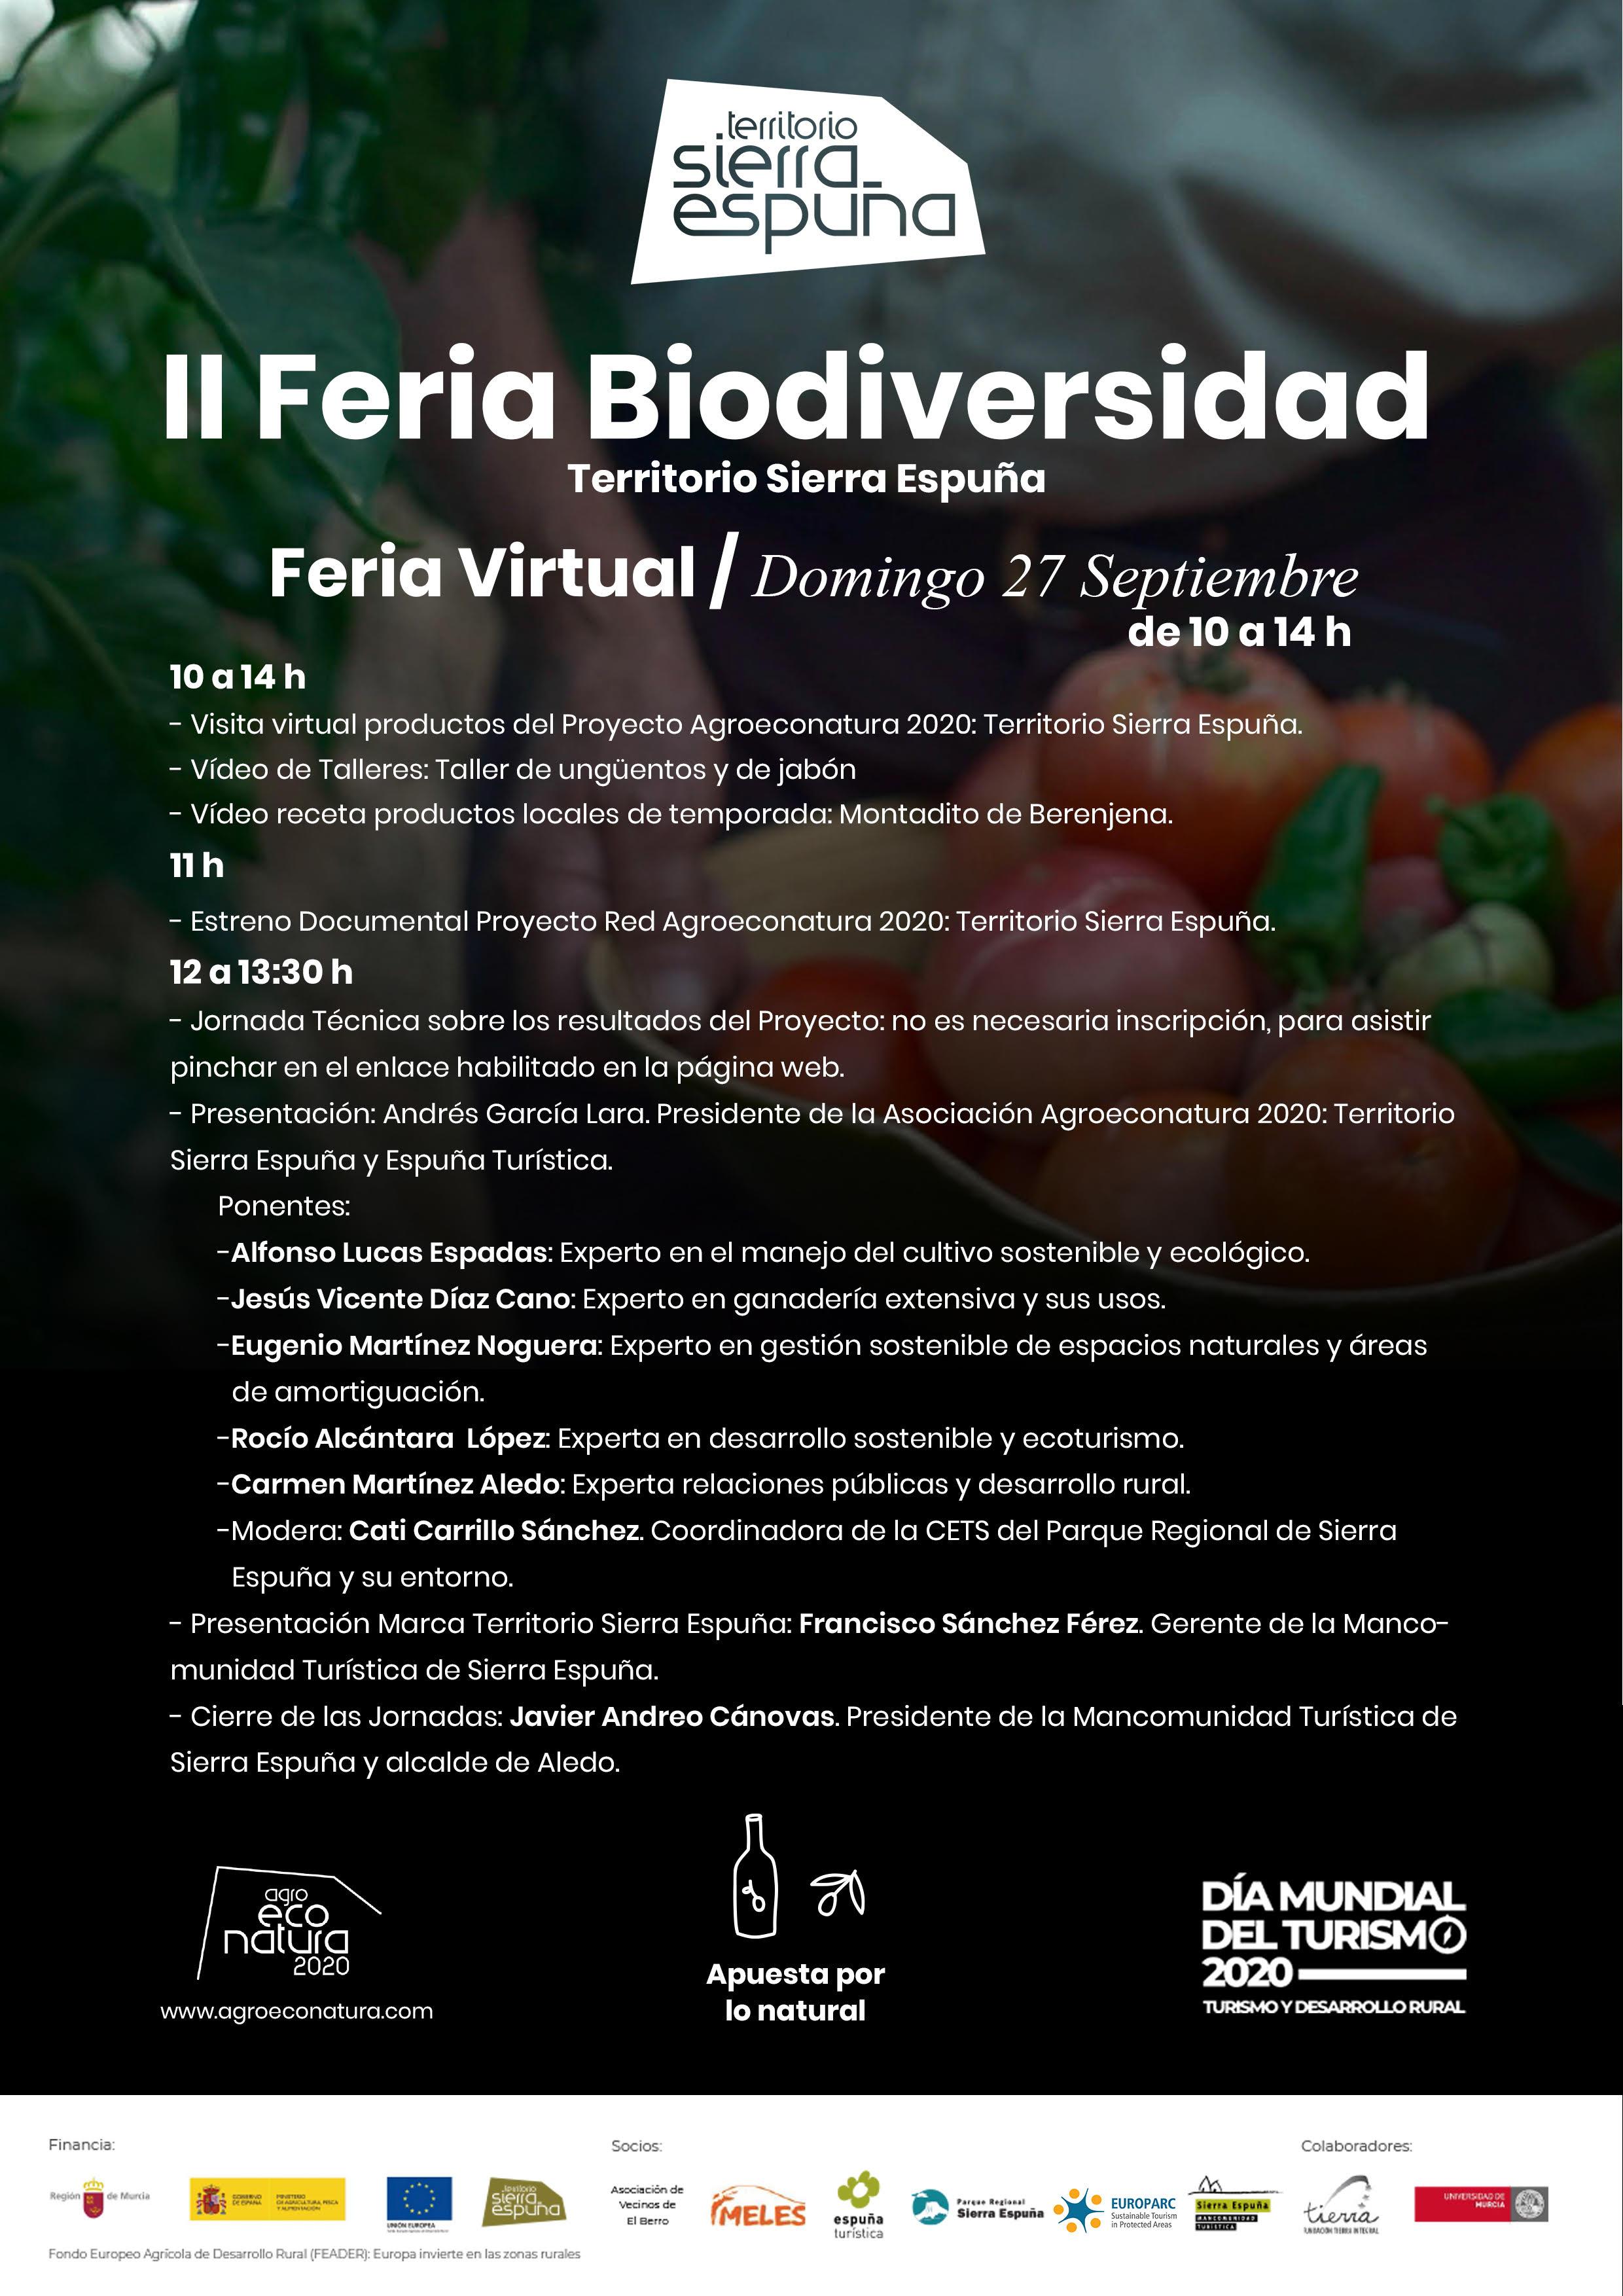 II Feria Biodiversidad Territorio Sierra Espuña